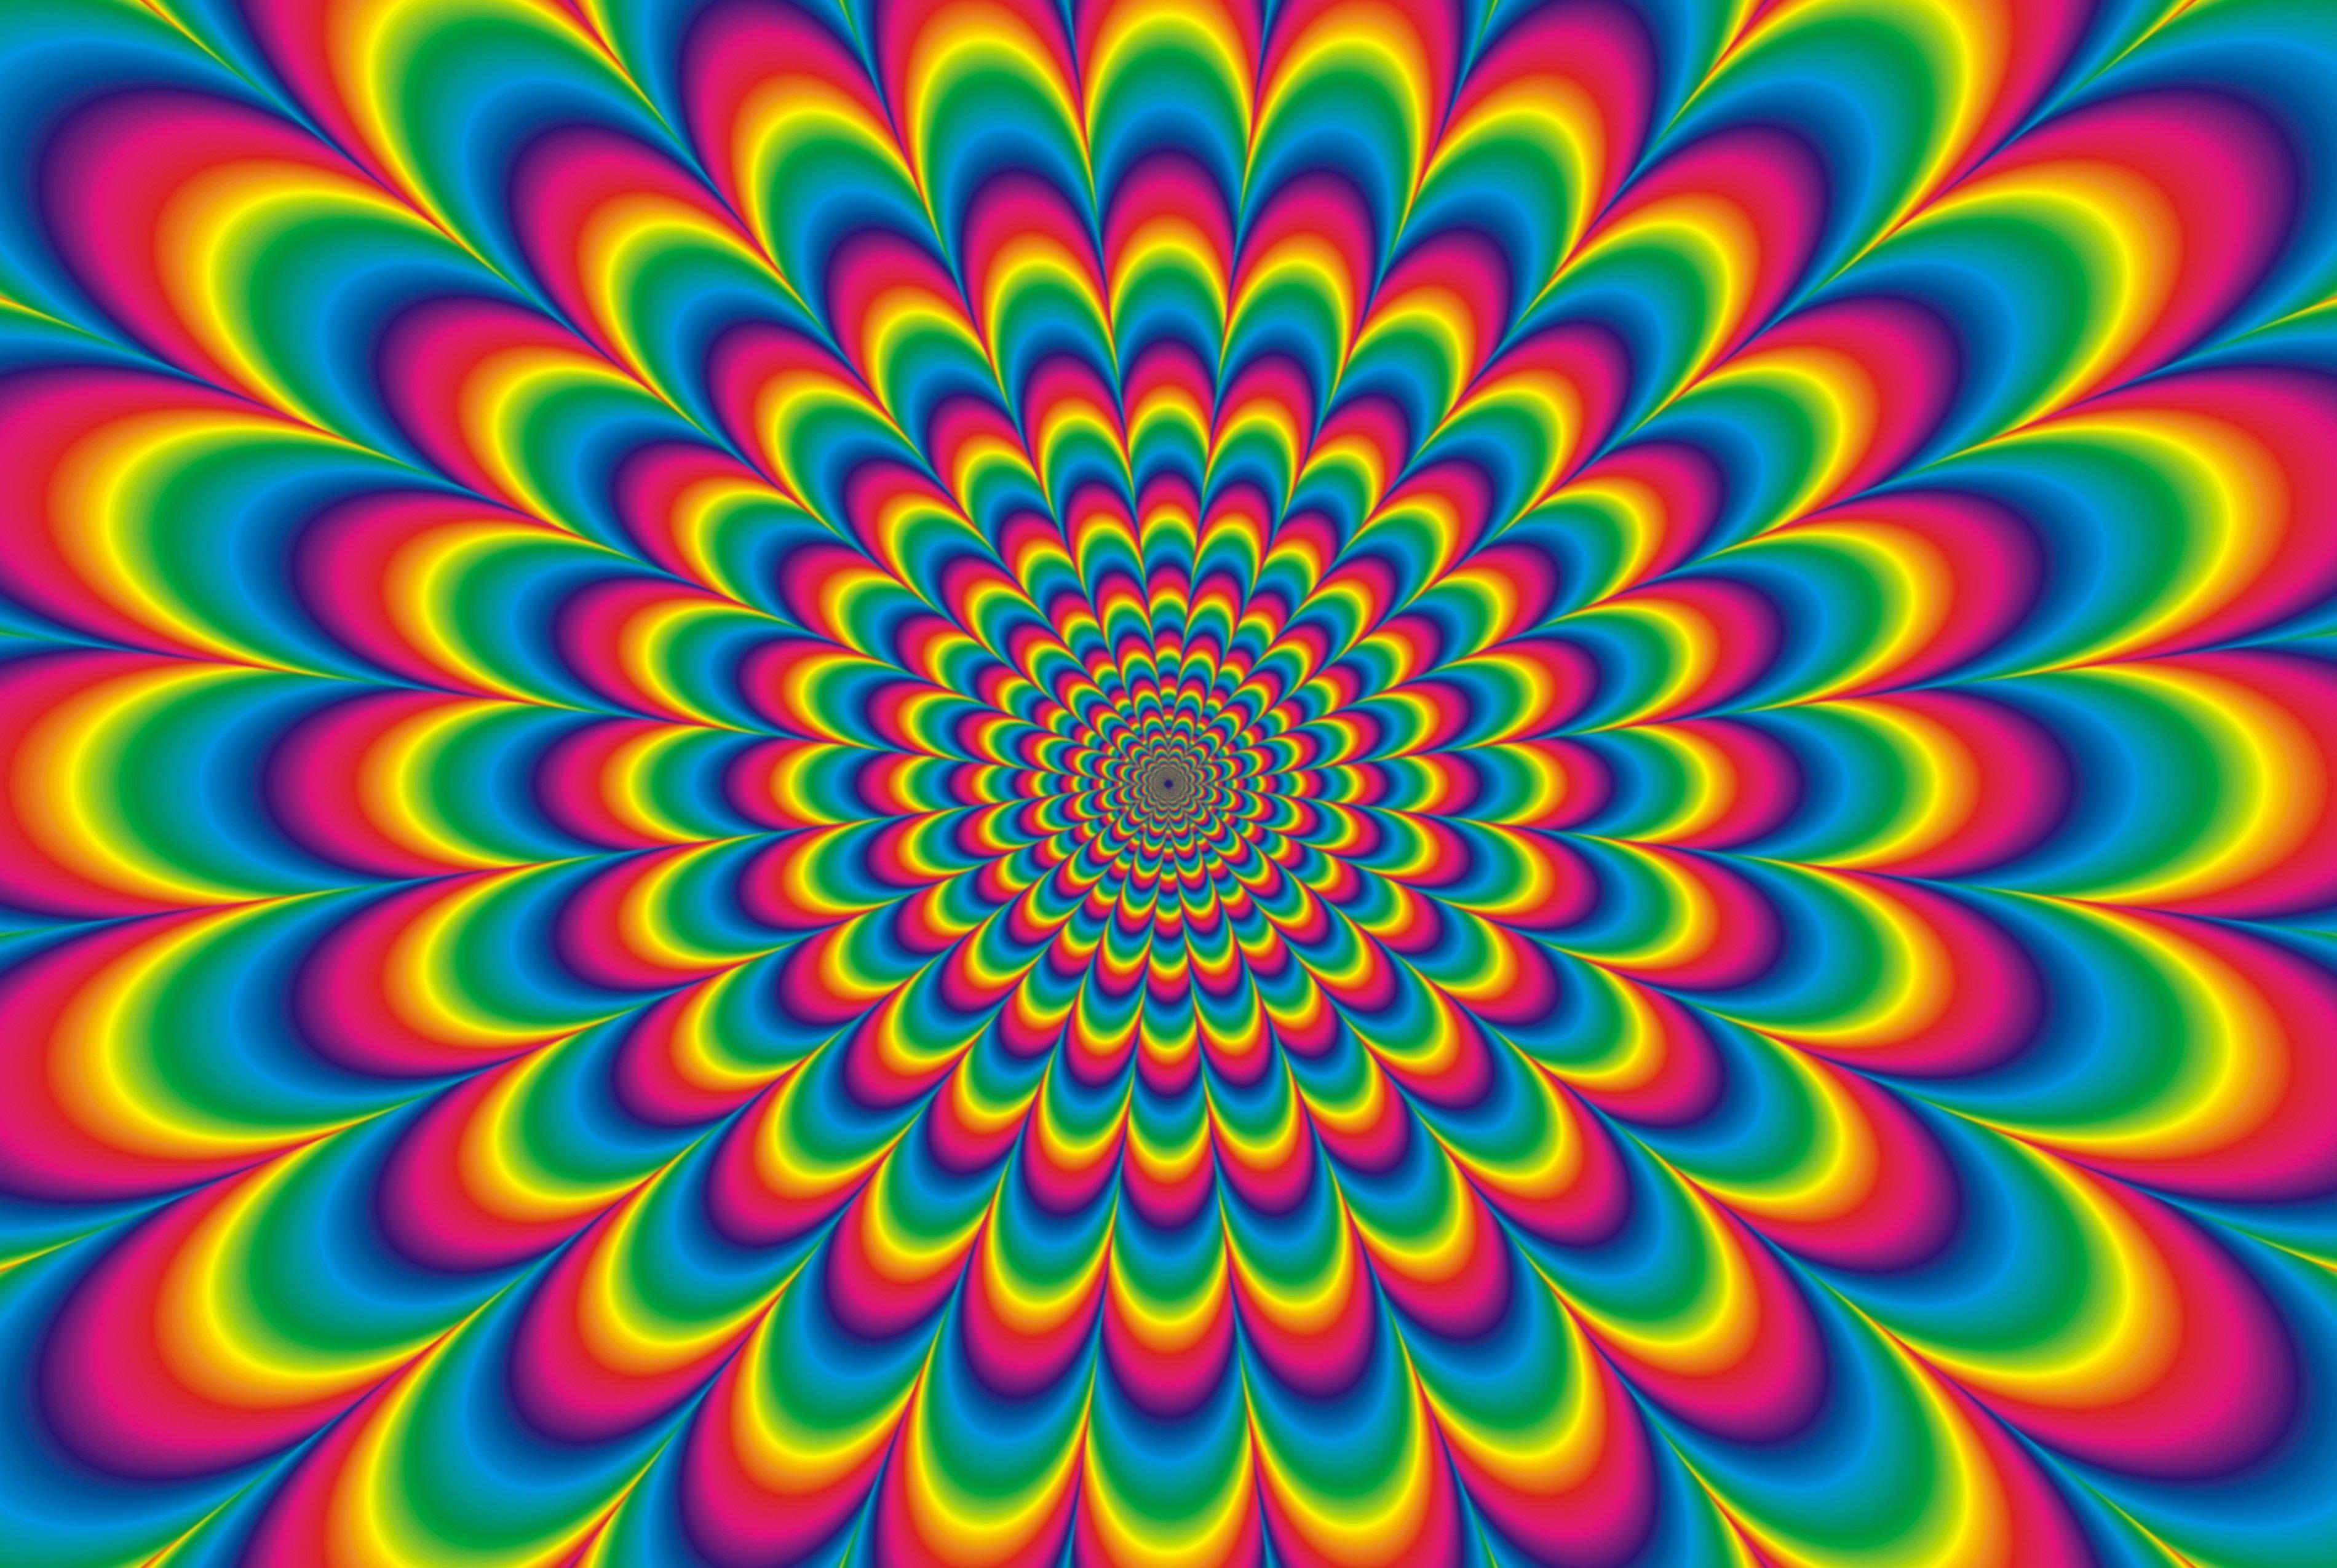 psychedelic-628494.jpg